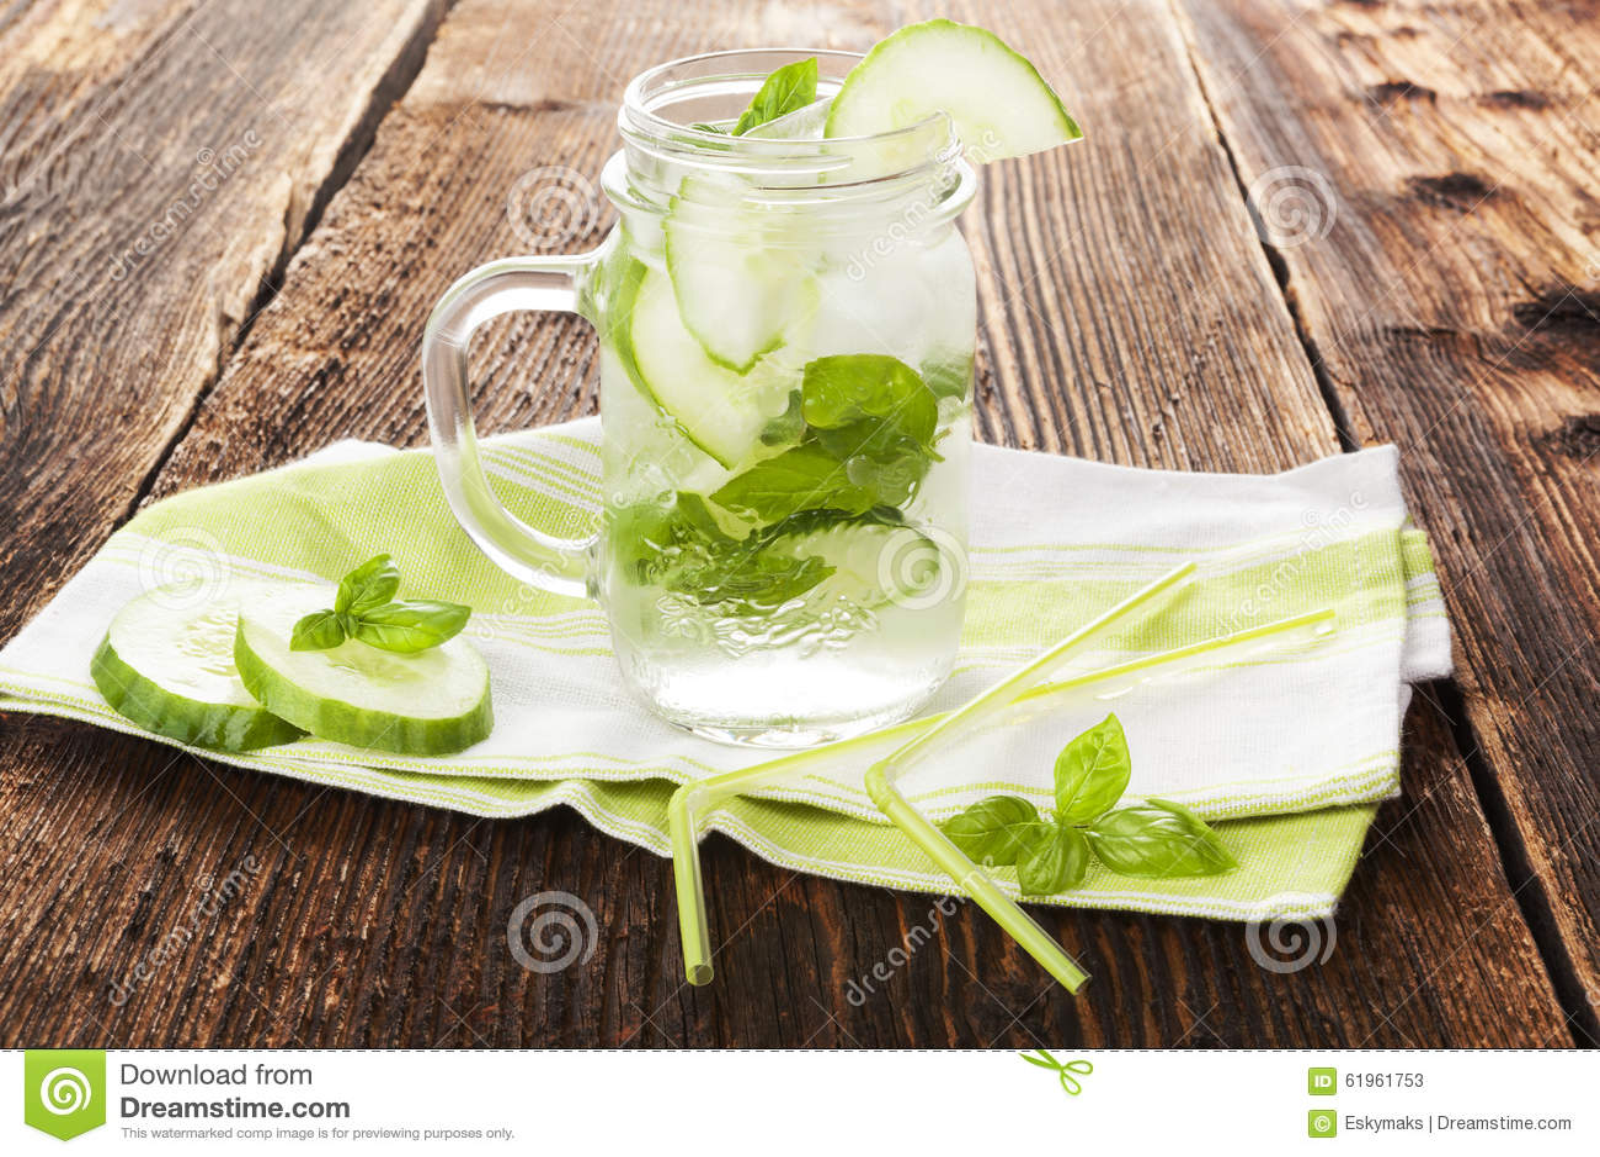 Cucumber basil lemonade on rustic wooden background. Healthy summer ...